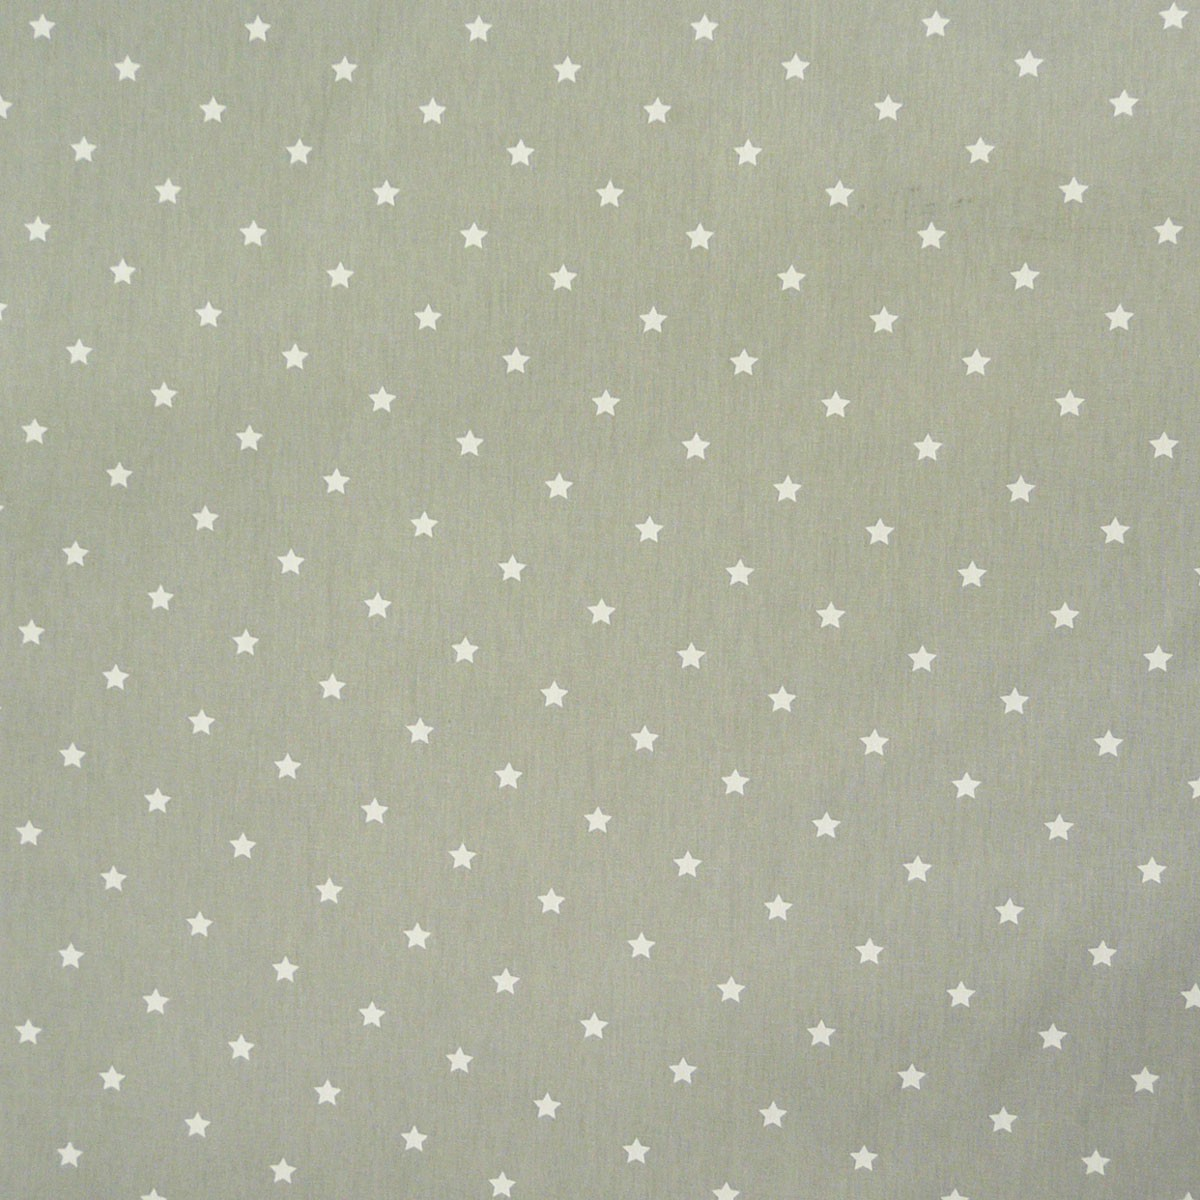 baumwollstoff twinkle sterne grau wei stoff gardinenstoff dekostoff stoffe stoffe gemustert. Black Bedroom Furniture Sets. Home Design Ideas